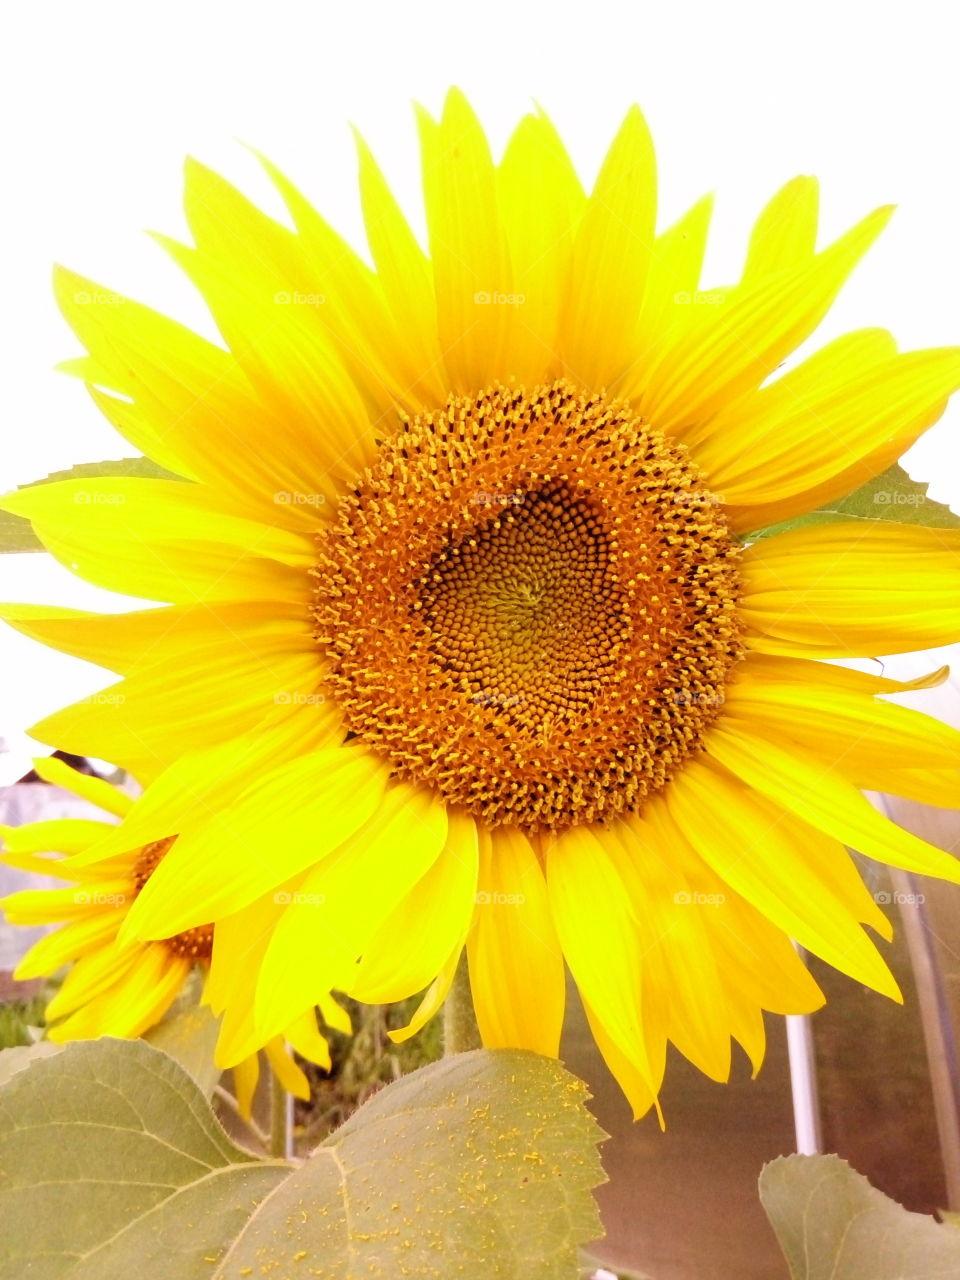 подсолнух.лето.солнышко.природа.флора.